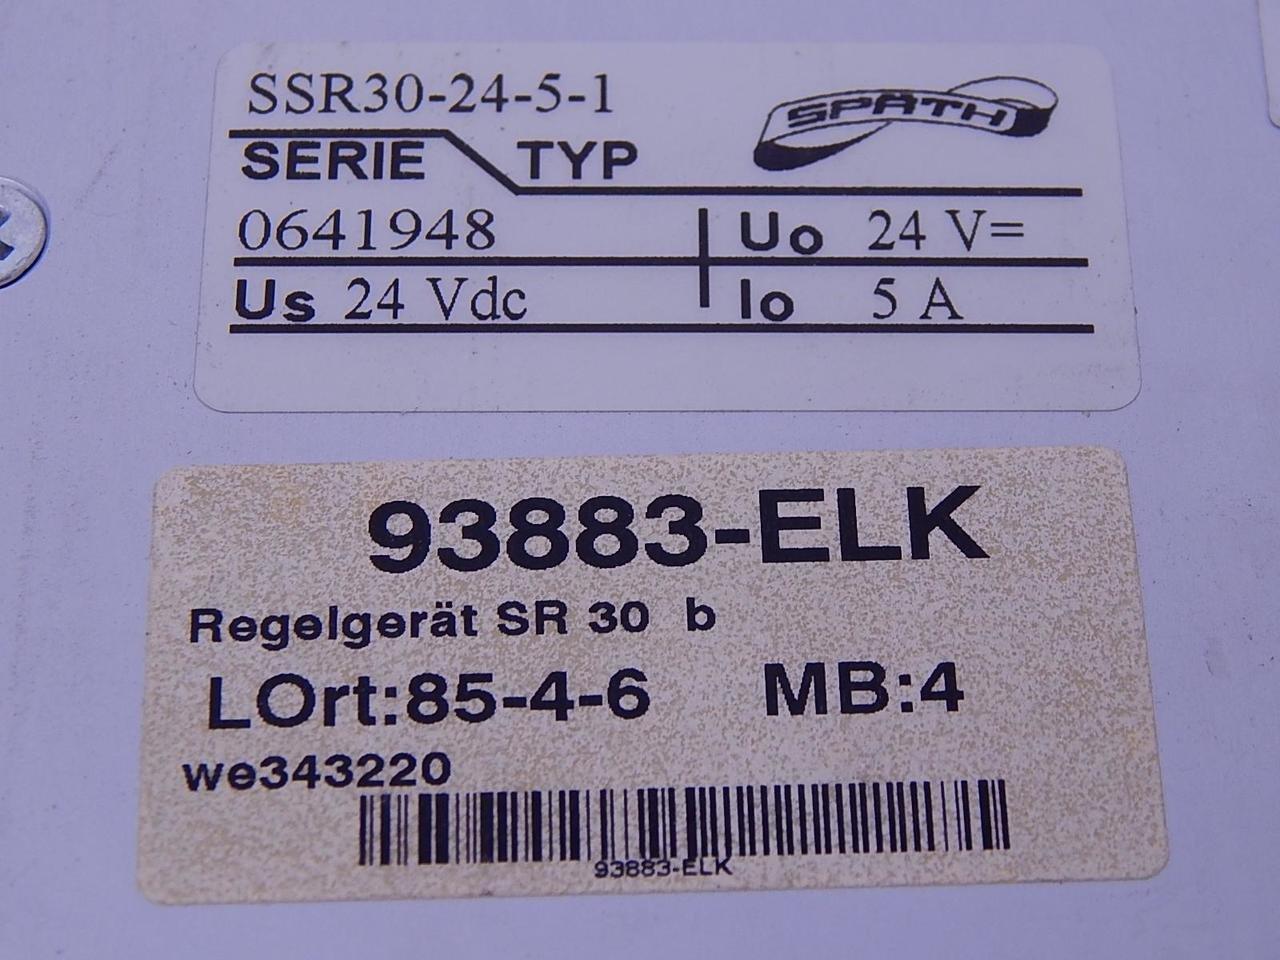 Spath 93883-ELK Power Supply T111244